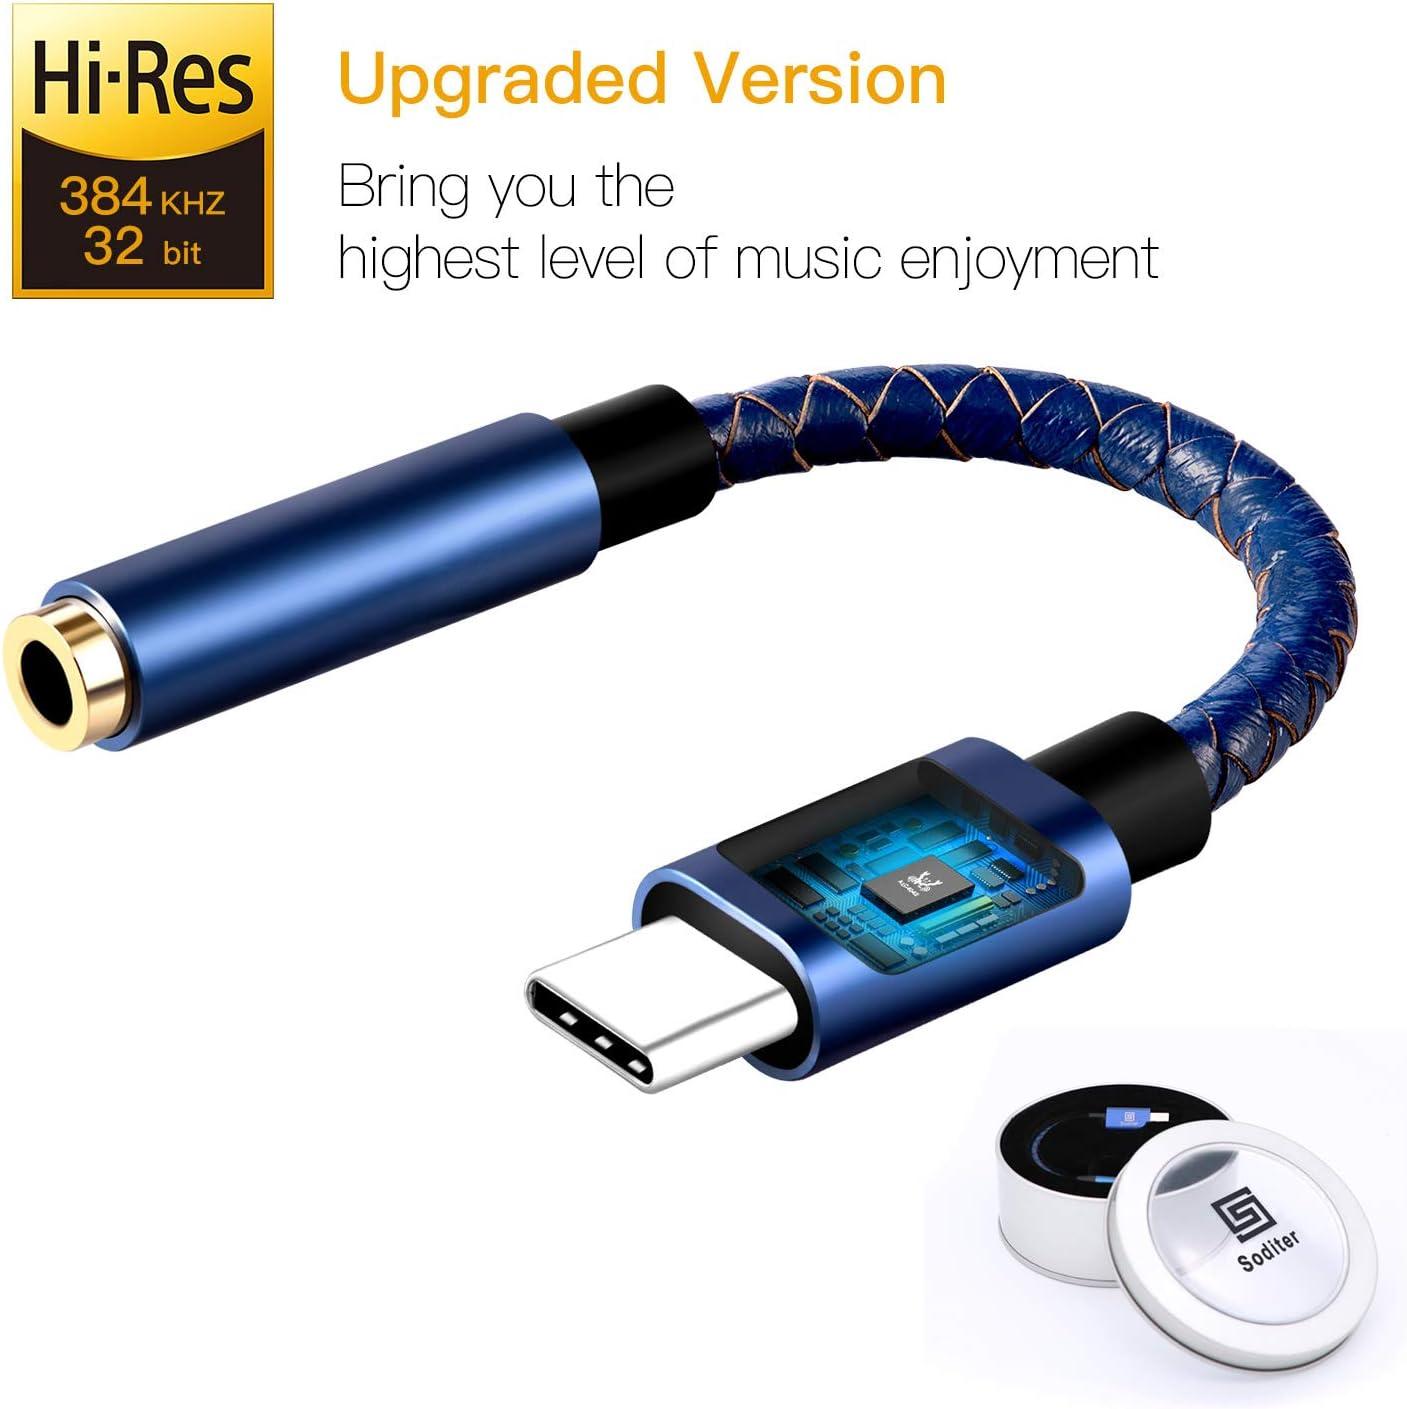 Soditer Pixel 2 Headphone Adapter,USB C to 3.5mm Adapter,USB C Dongle Headpone Jack Has Realtek DAC Hi-Res, Type c Earphone Convert for Pixel 2/2XL/3/3XL, MacBook 2017 IPad Pro 2018, Moto Z2, OnePlus